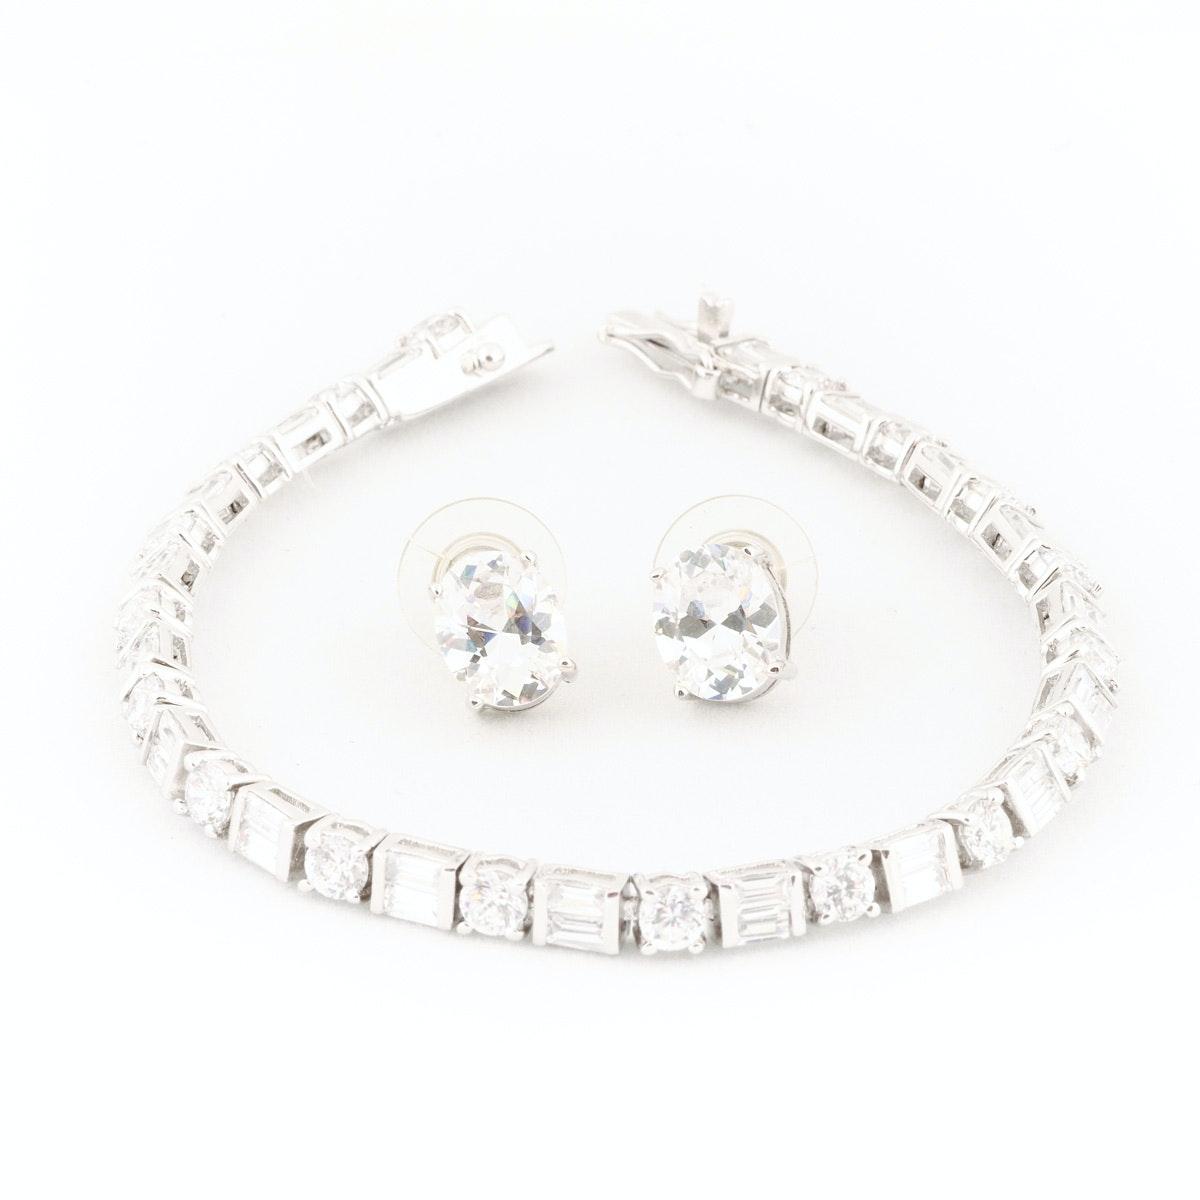 Tennis Bracelet and Earrings